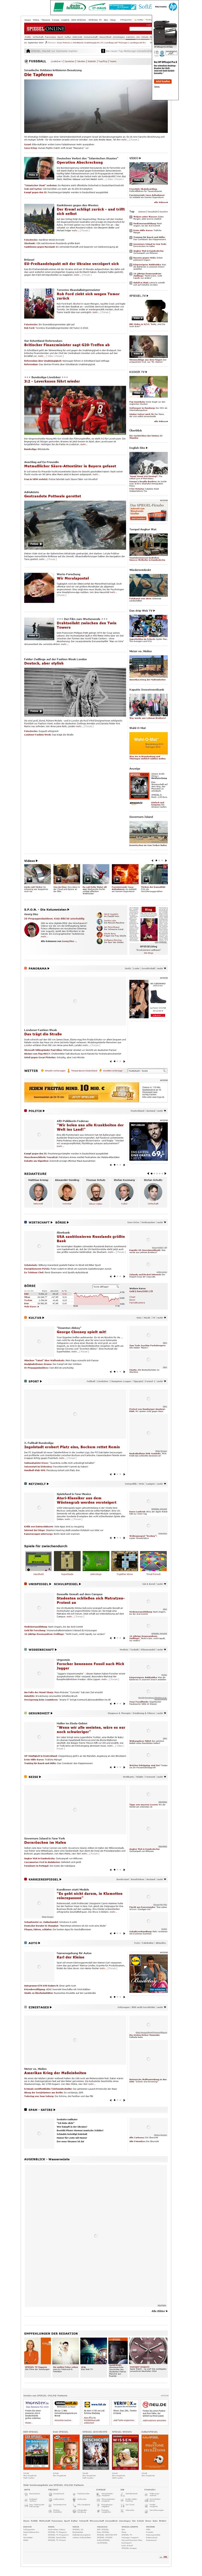 Spiegel Online at Friday Sept. 12, 2014, 8:18 p.m. UTC